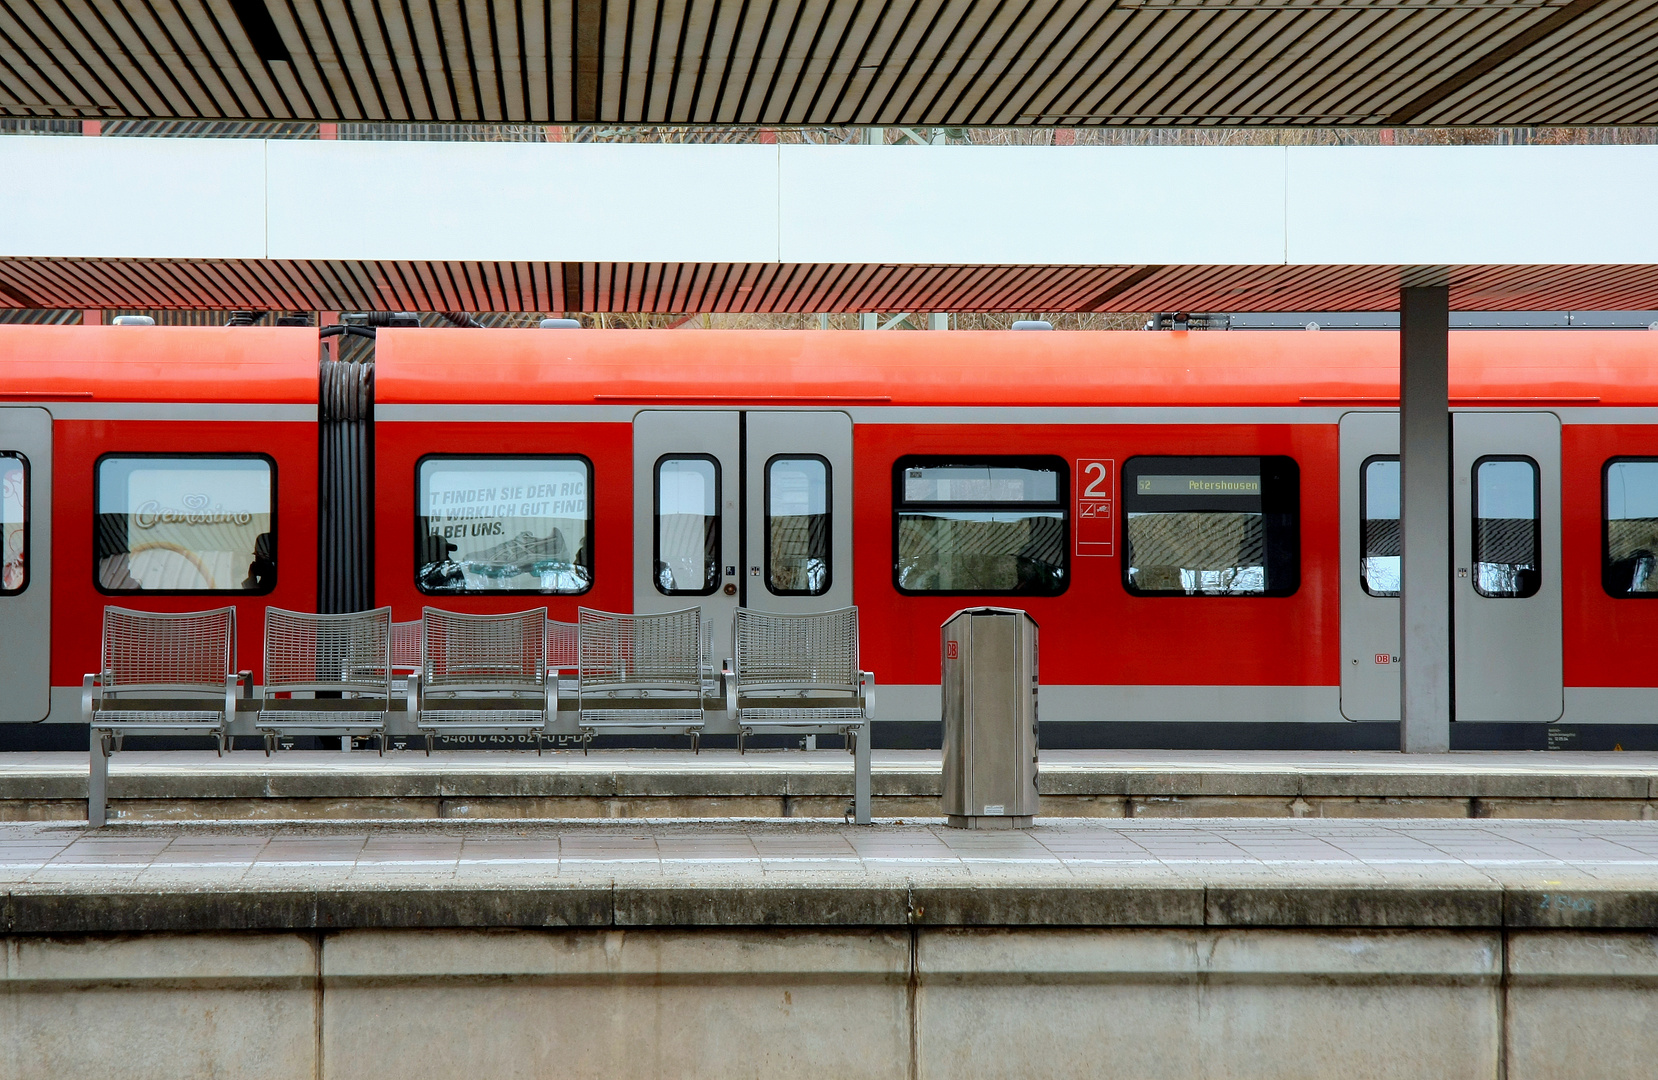 Rote Bahn